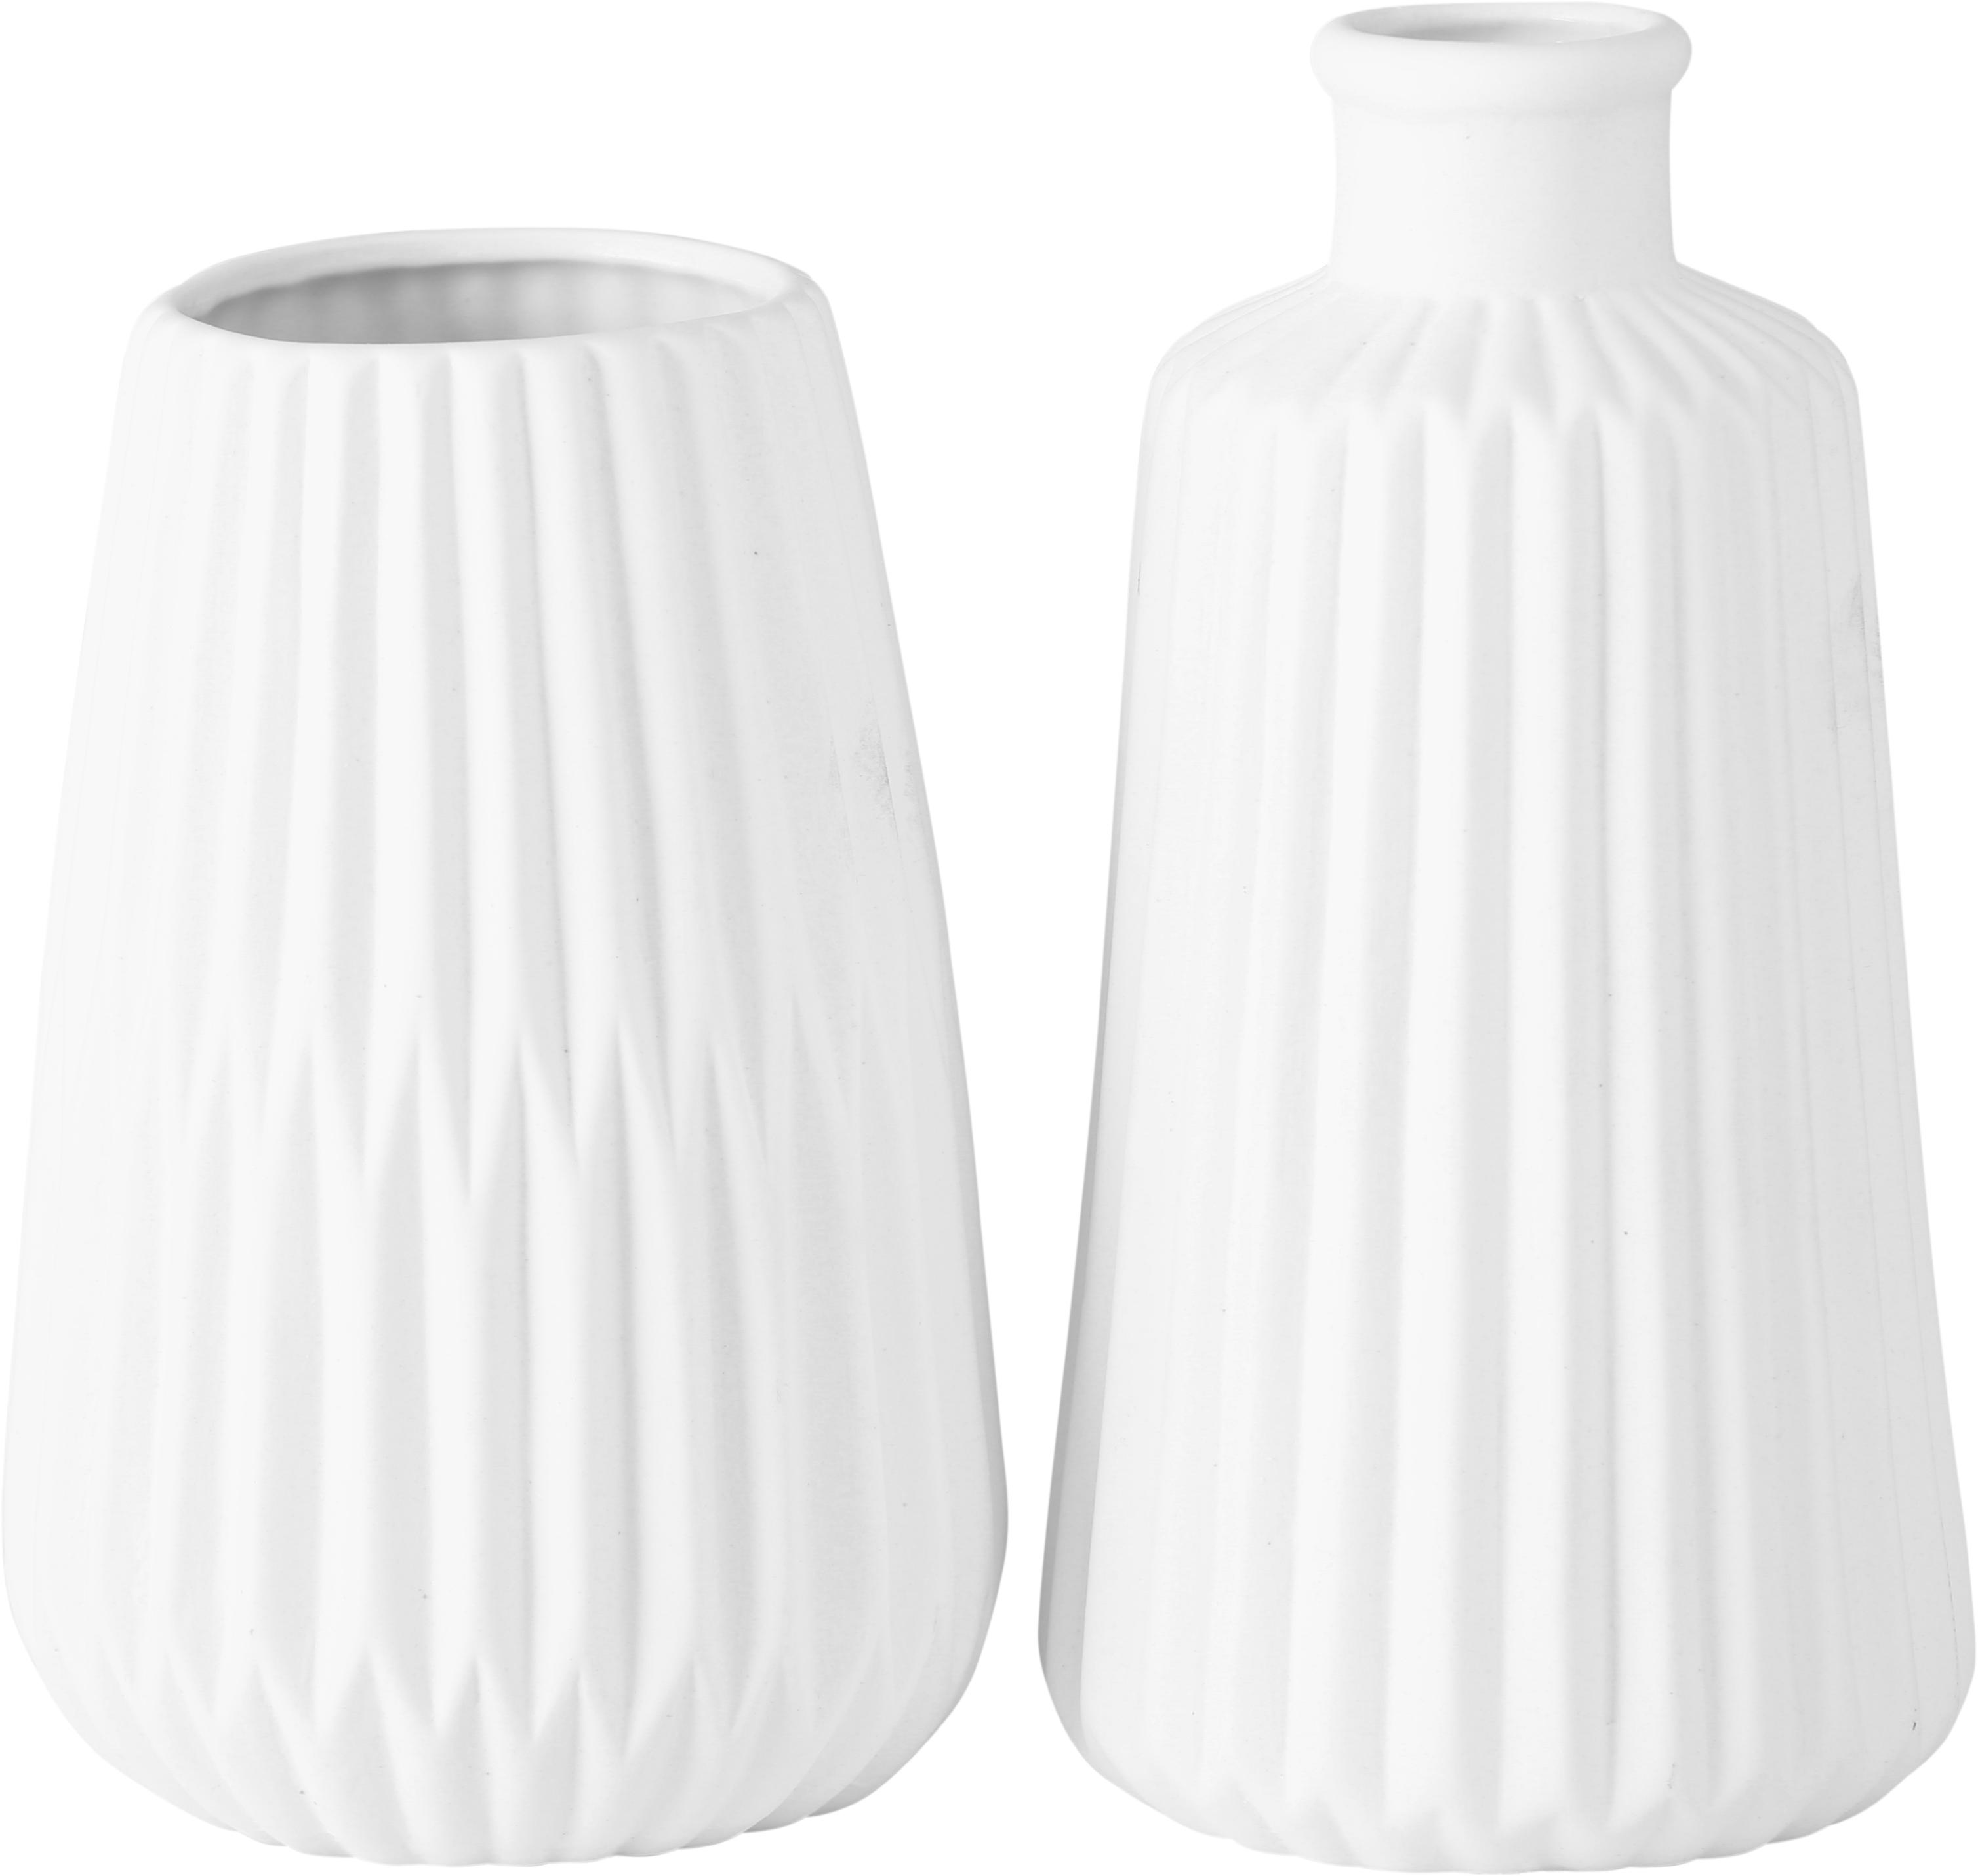 Set de jarrones de porcena Esko, 2pzas., Porcelana, Blanco, Ø 8 x Al 17 cm